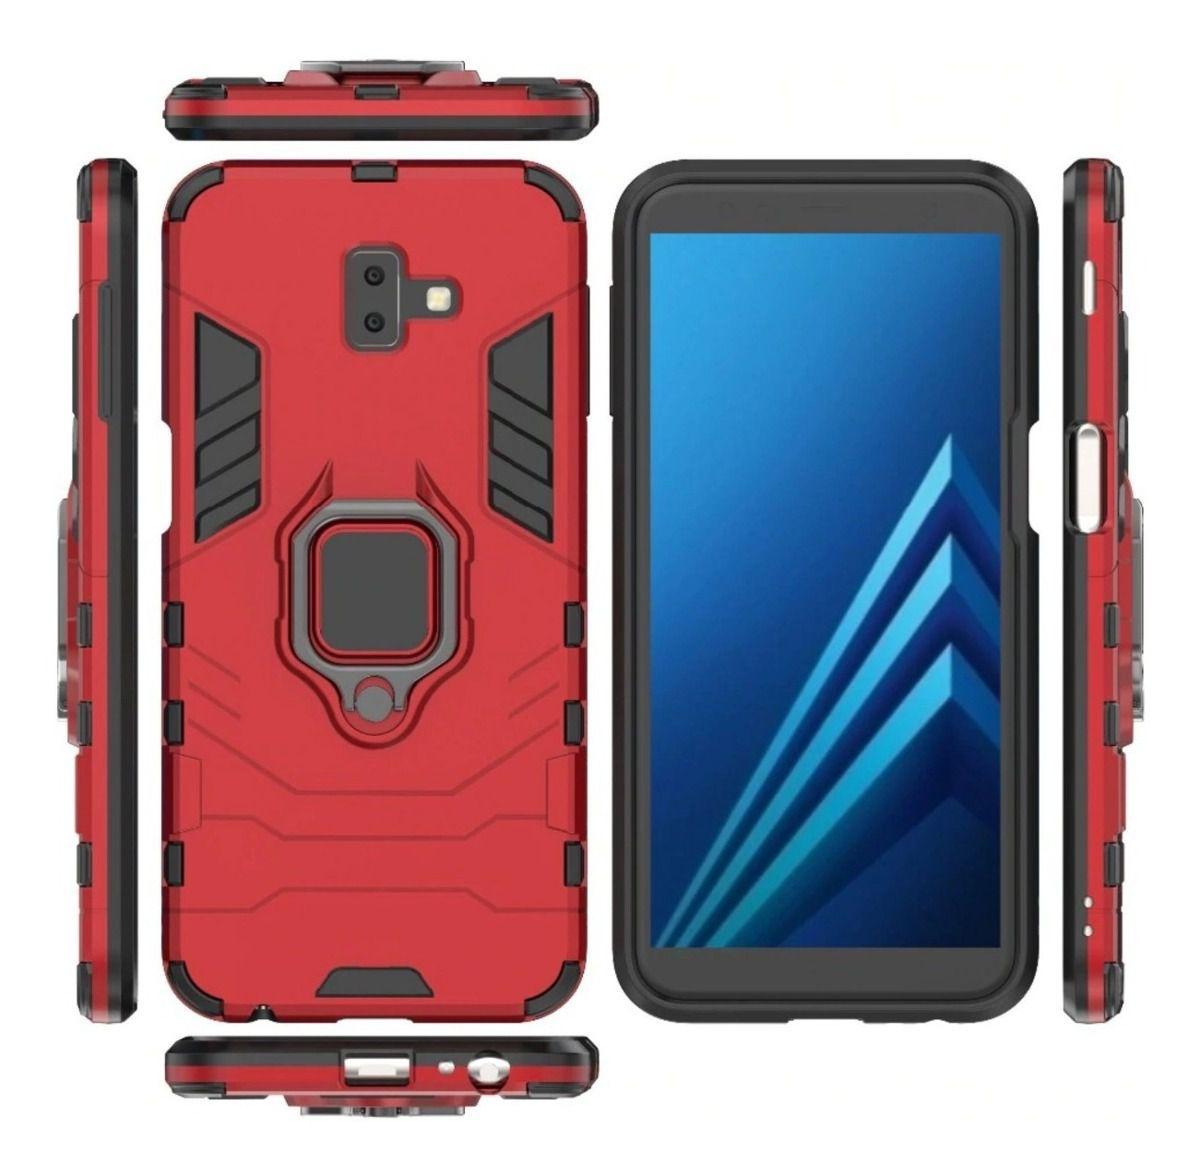 Capa Armadura + Película 5D Samsung J6 Plus Prime + Suporte Magnético